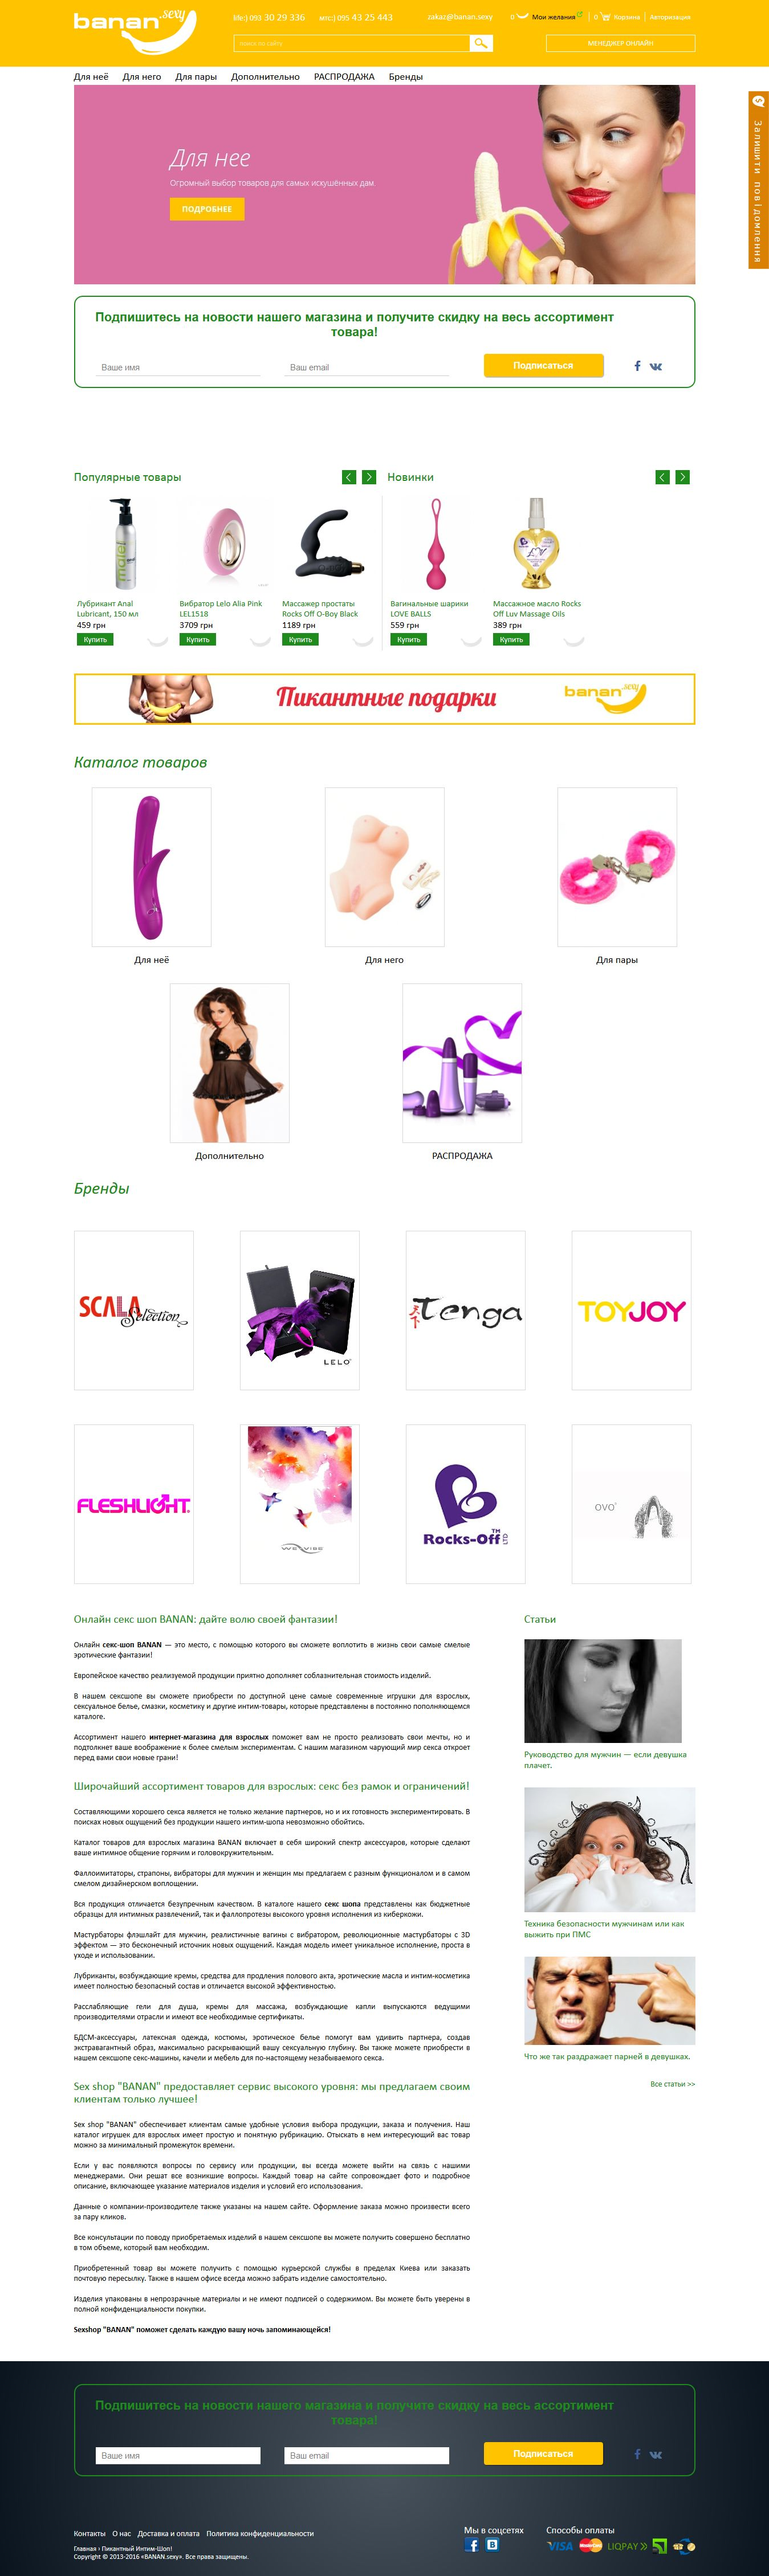 Интернет-магазин «Banan.sexy»